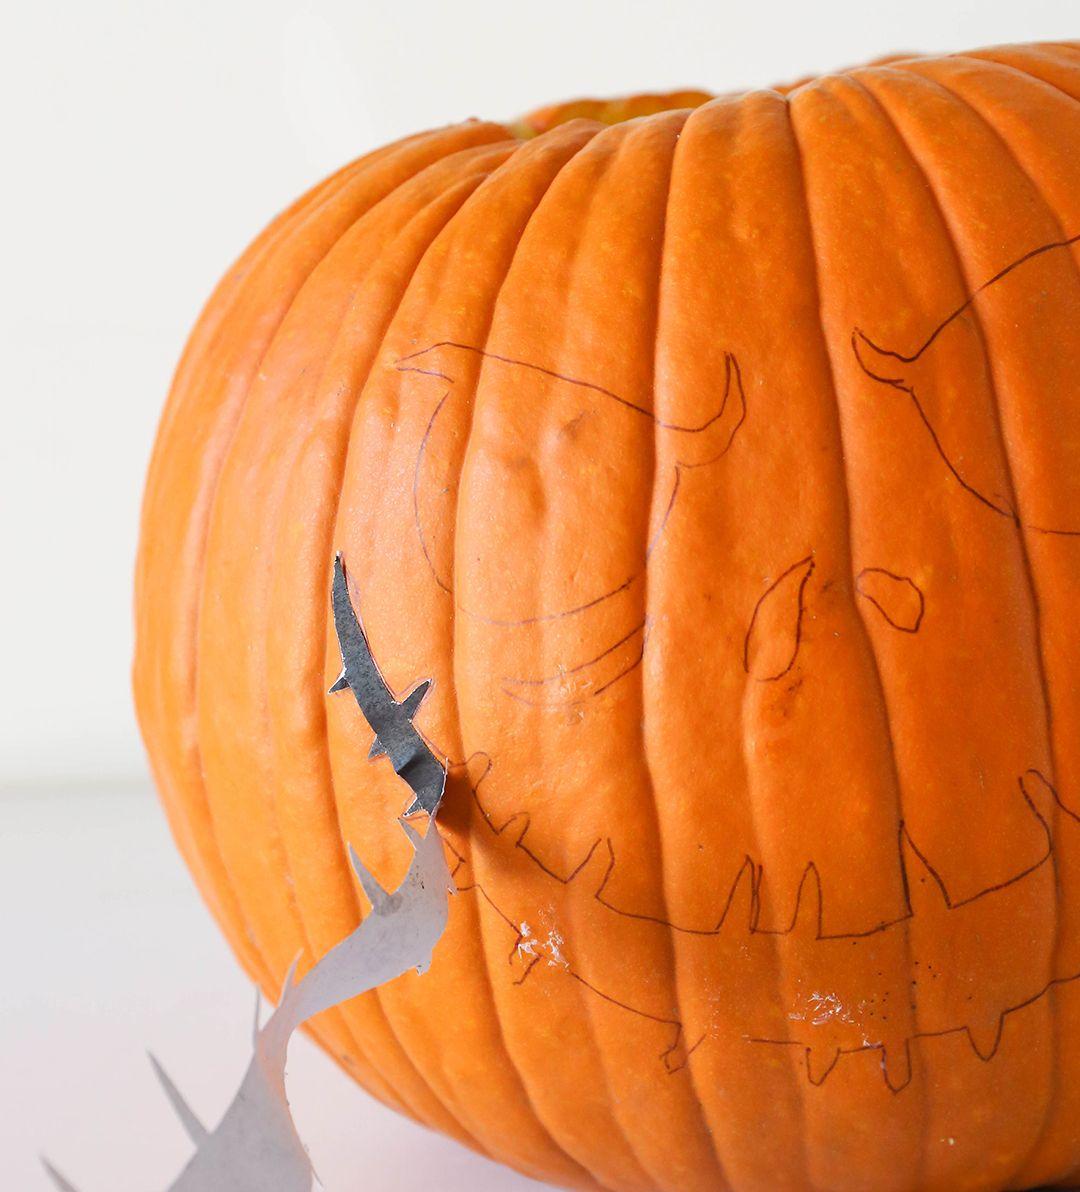 Bring Back Jack Skellington with This Pumpkin Carving